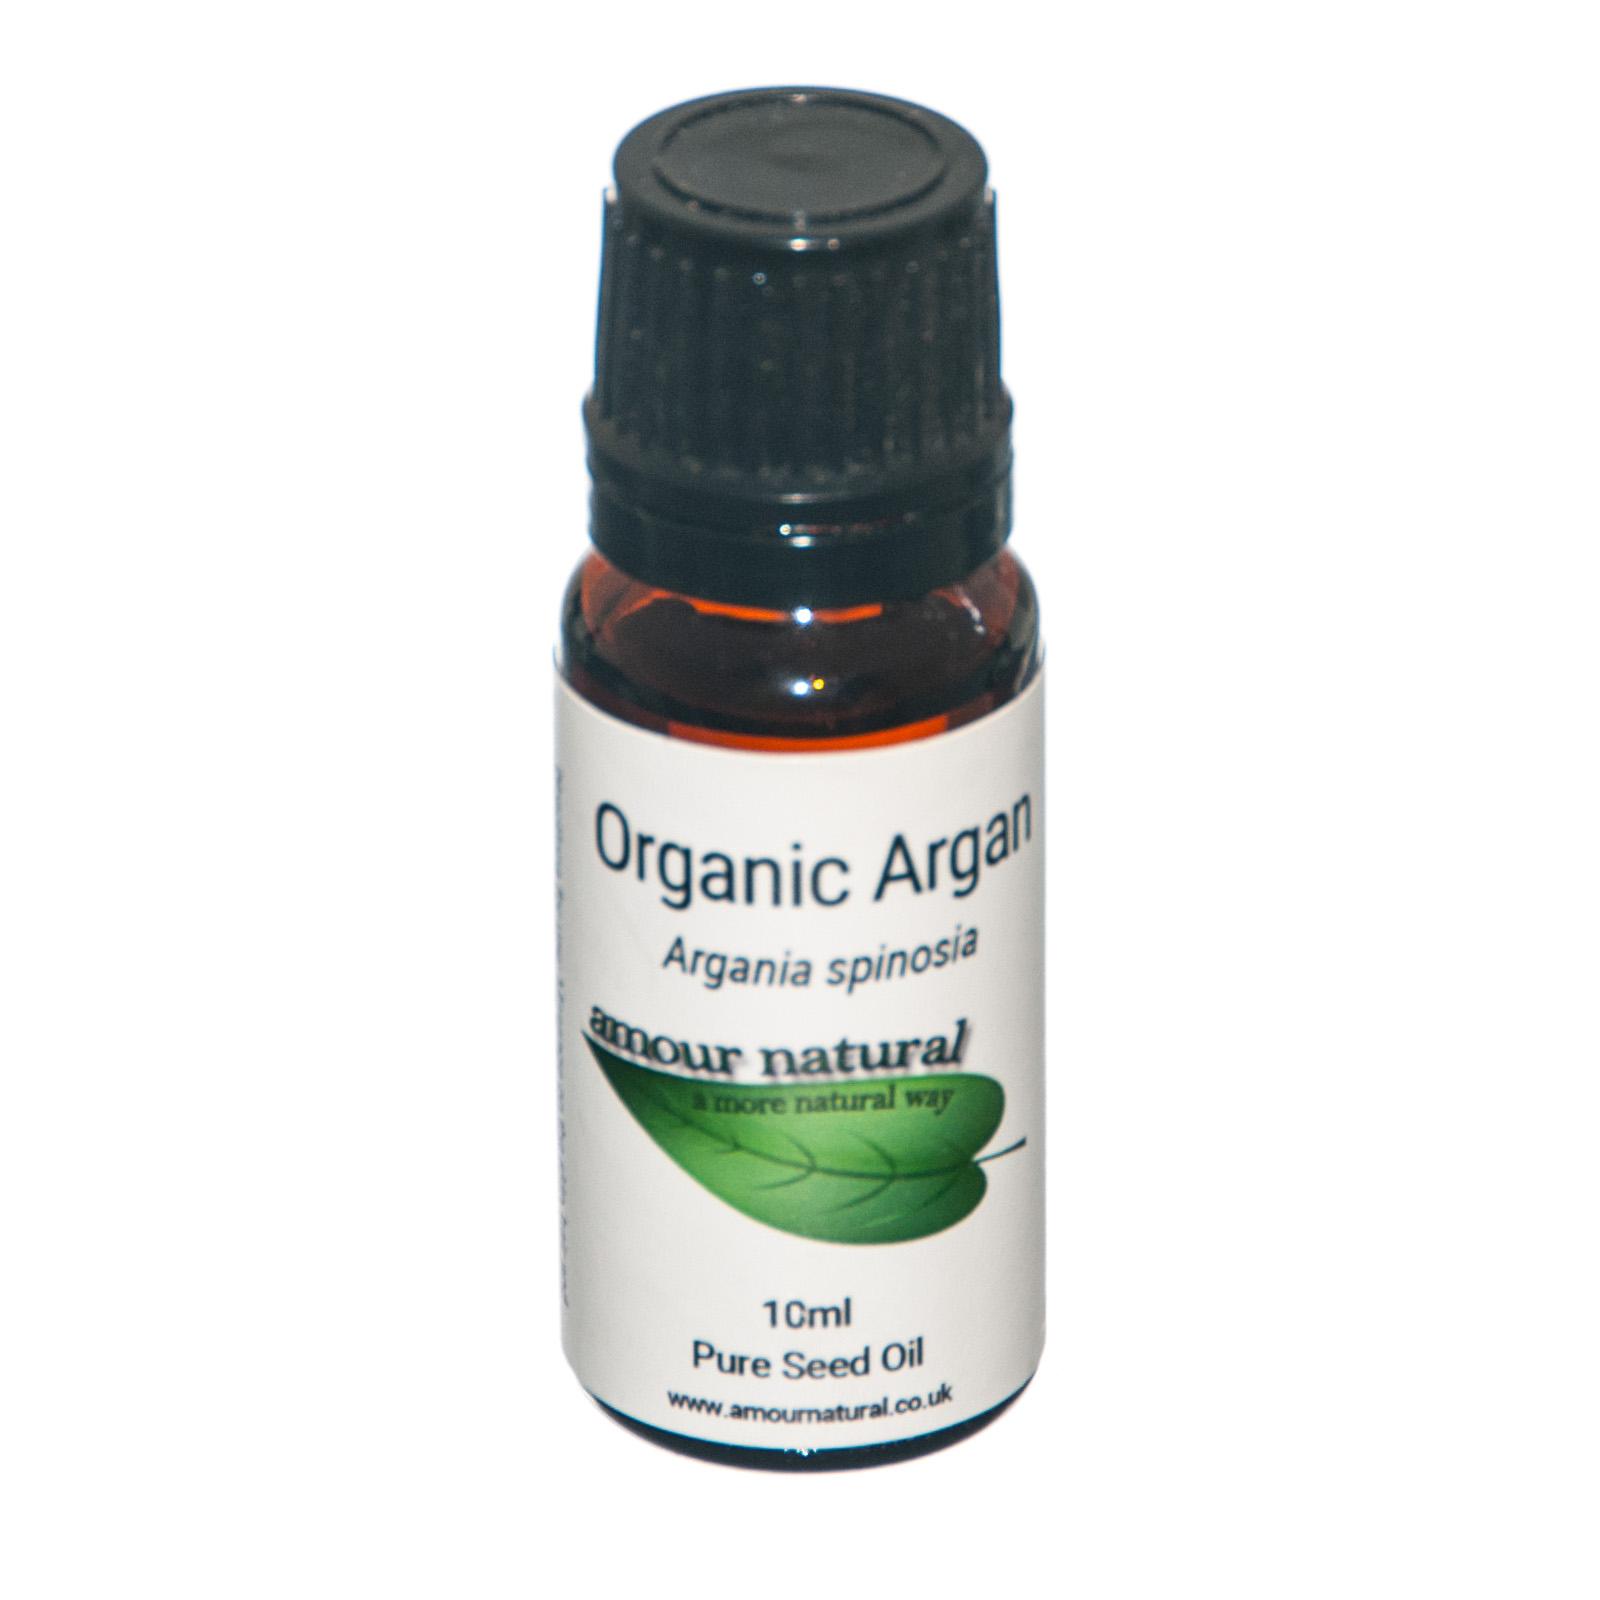 Organic Argan Oil 10ml